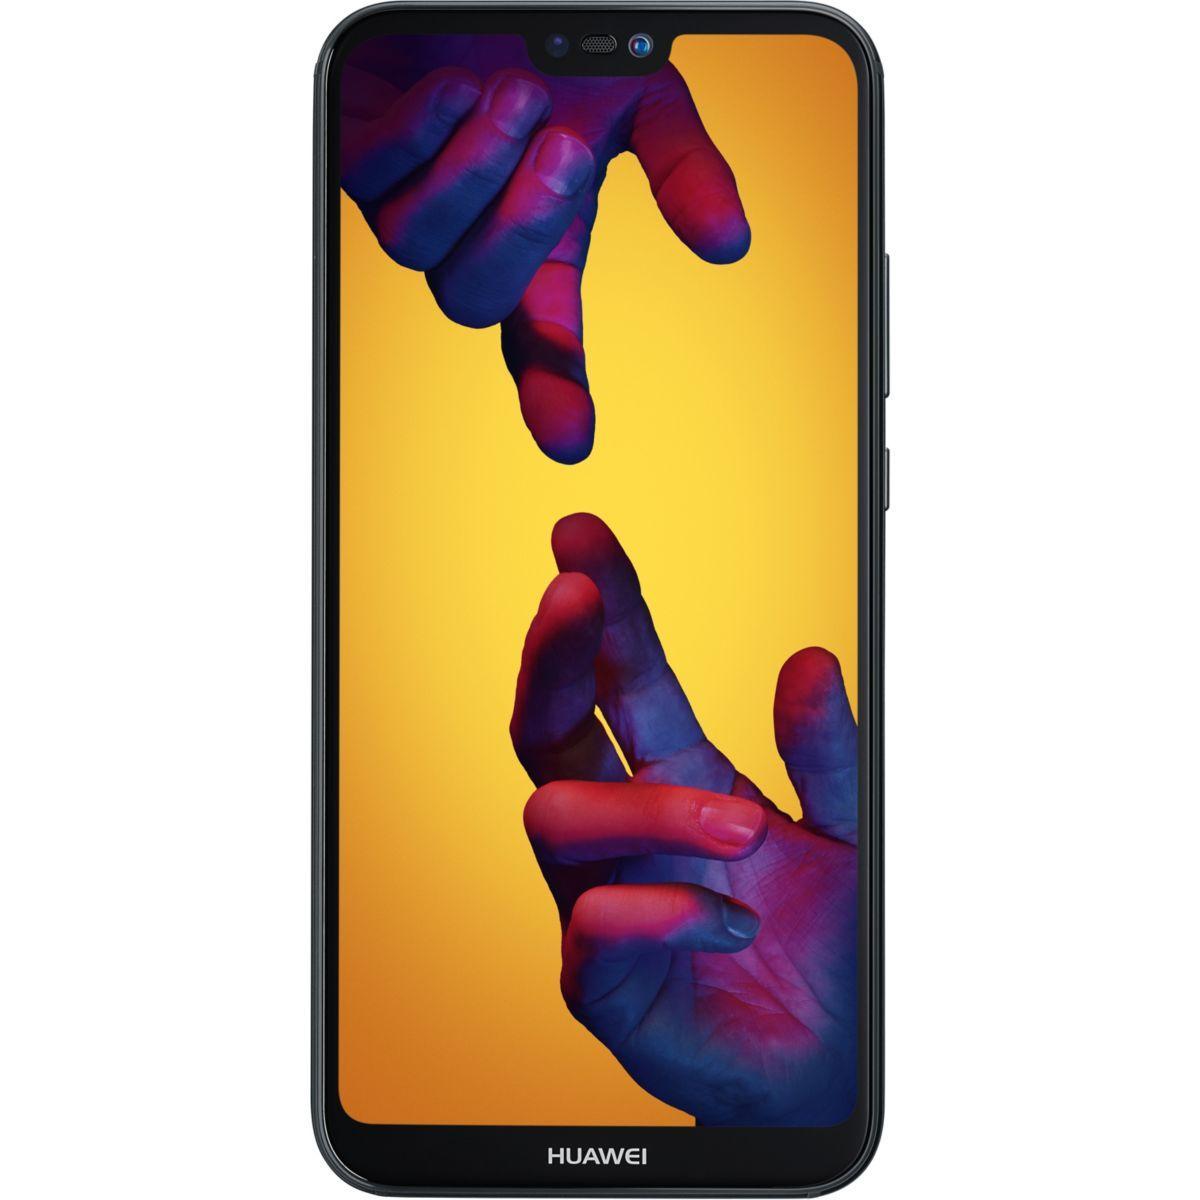 Smartphone huawei p20 lite noir - livraison offerte : code liv